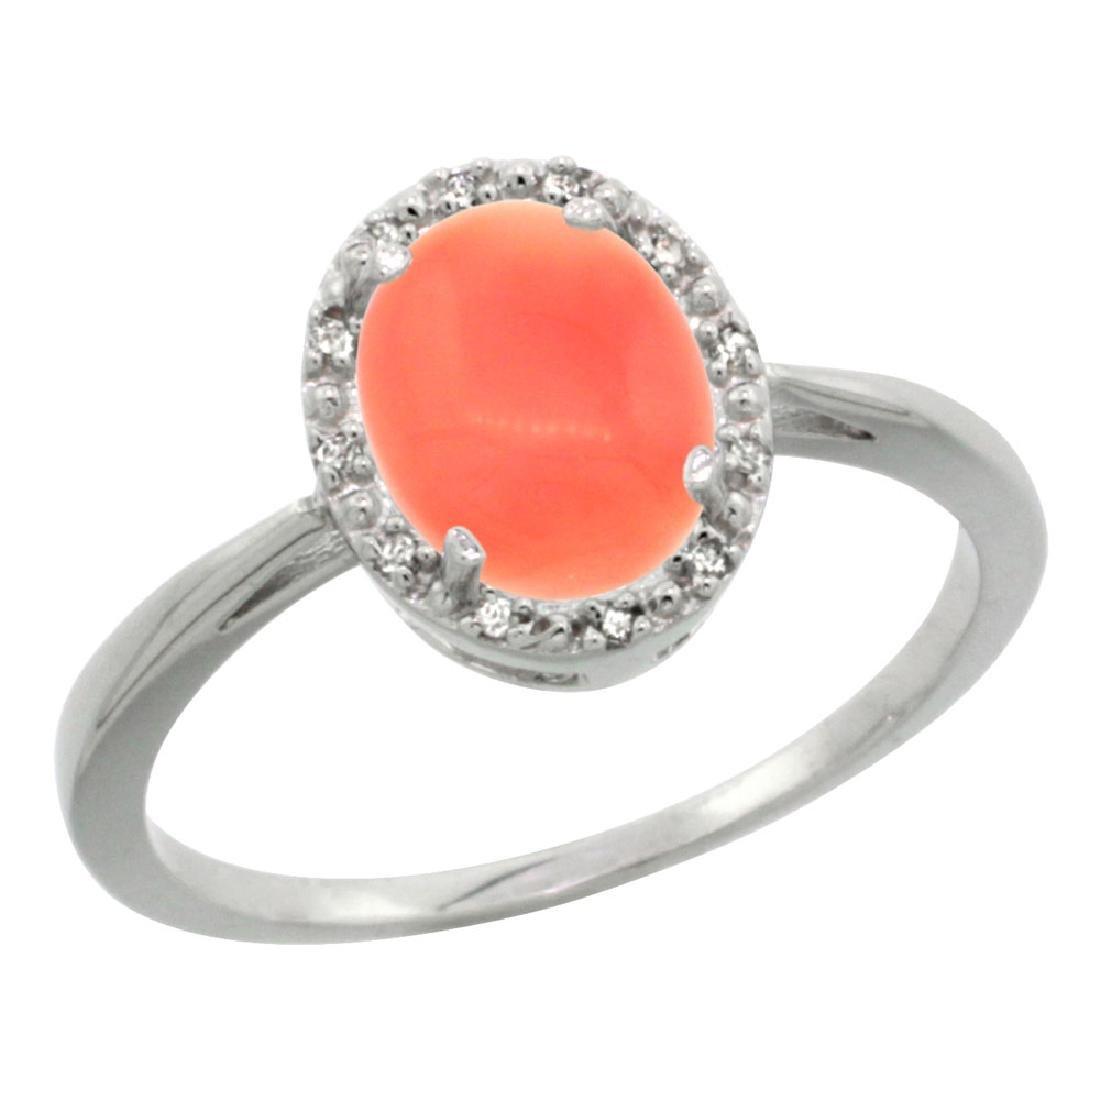 Natural 1.17 ctw Coral & Diamond Engagement Ring 14K